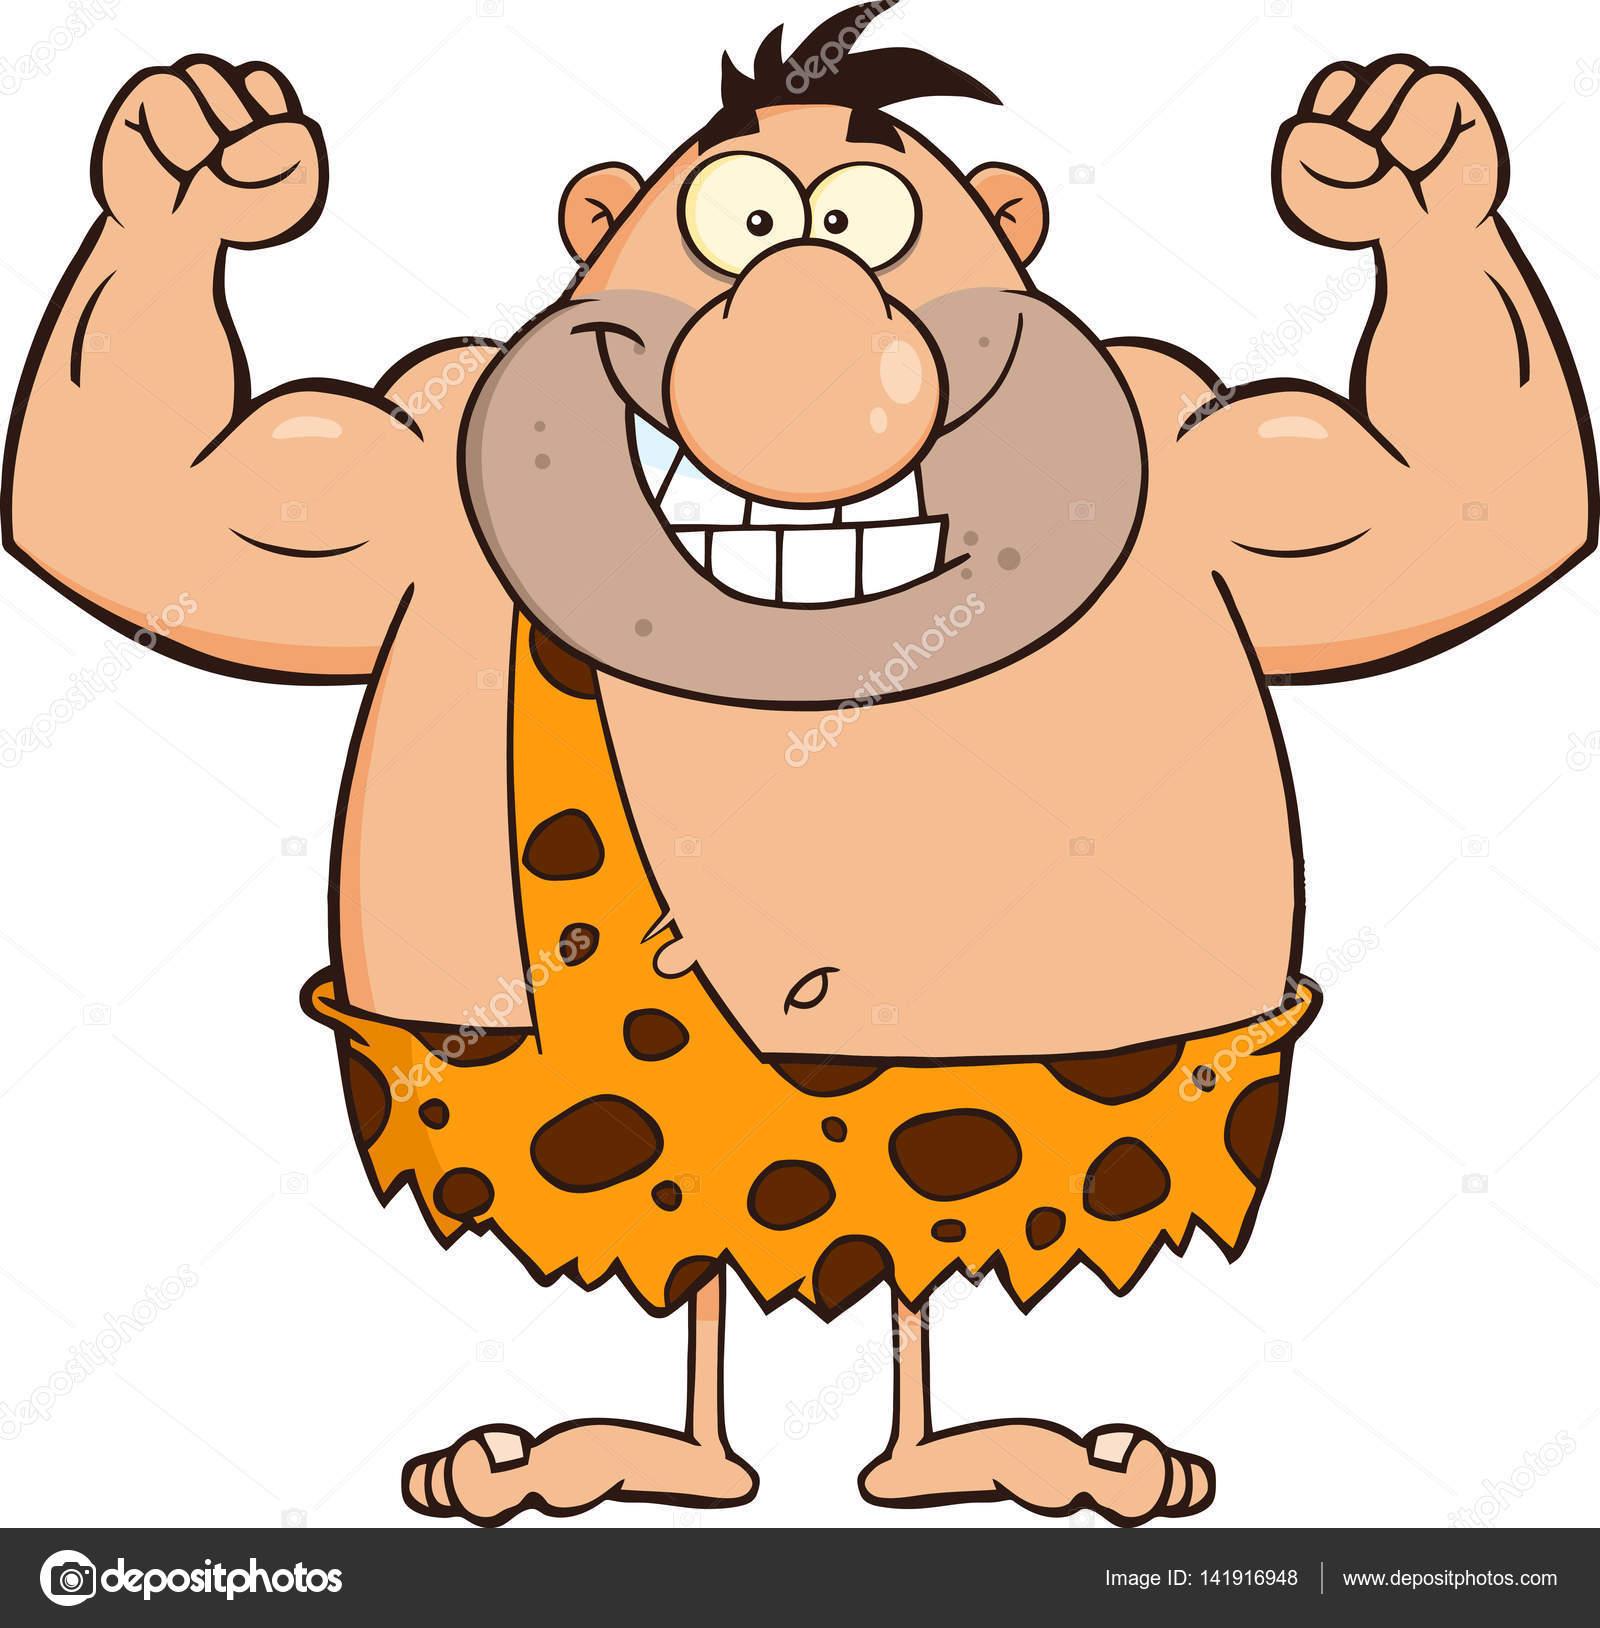 Cartoon Characters Funny : Funny caveman cartoon adultcartoon